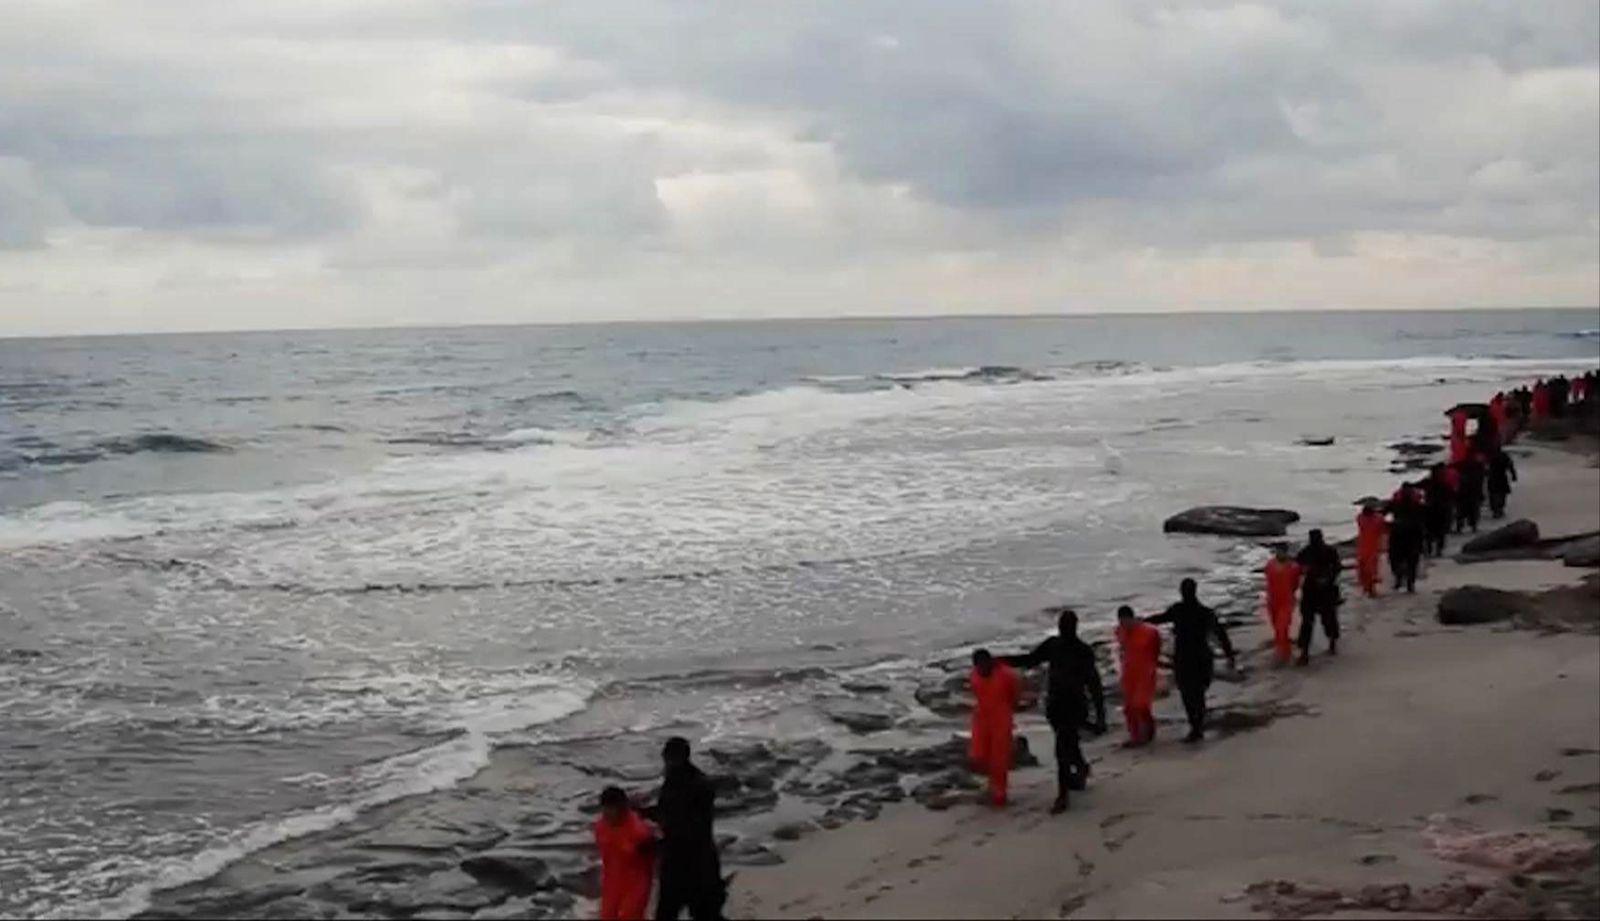 Islamic State Copts / DER SPIEGEL 9/2015 pp102 SPIN Libyen